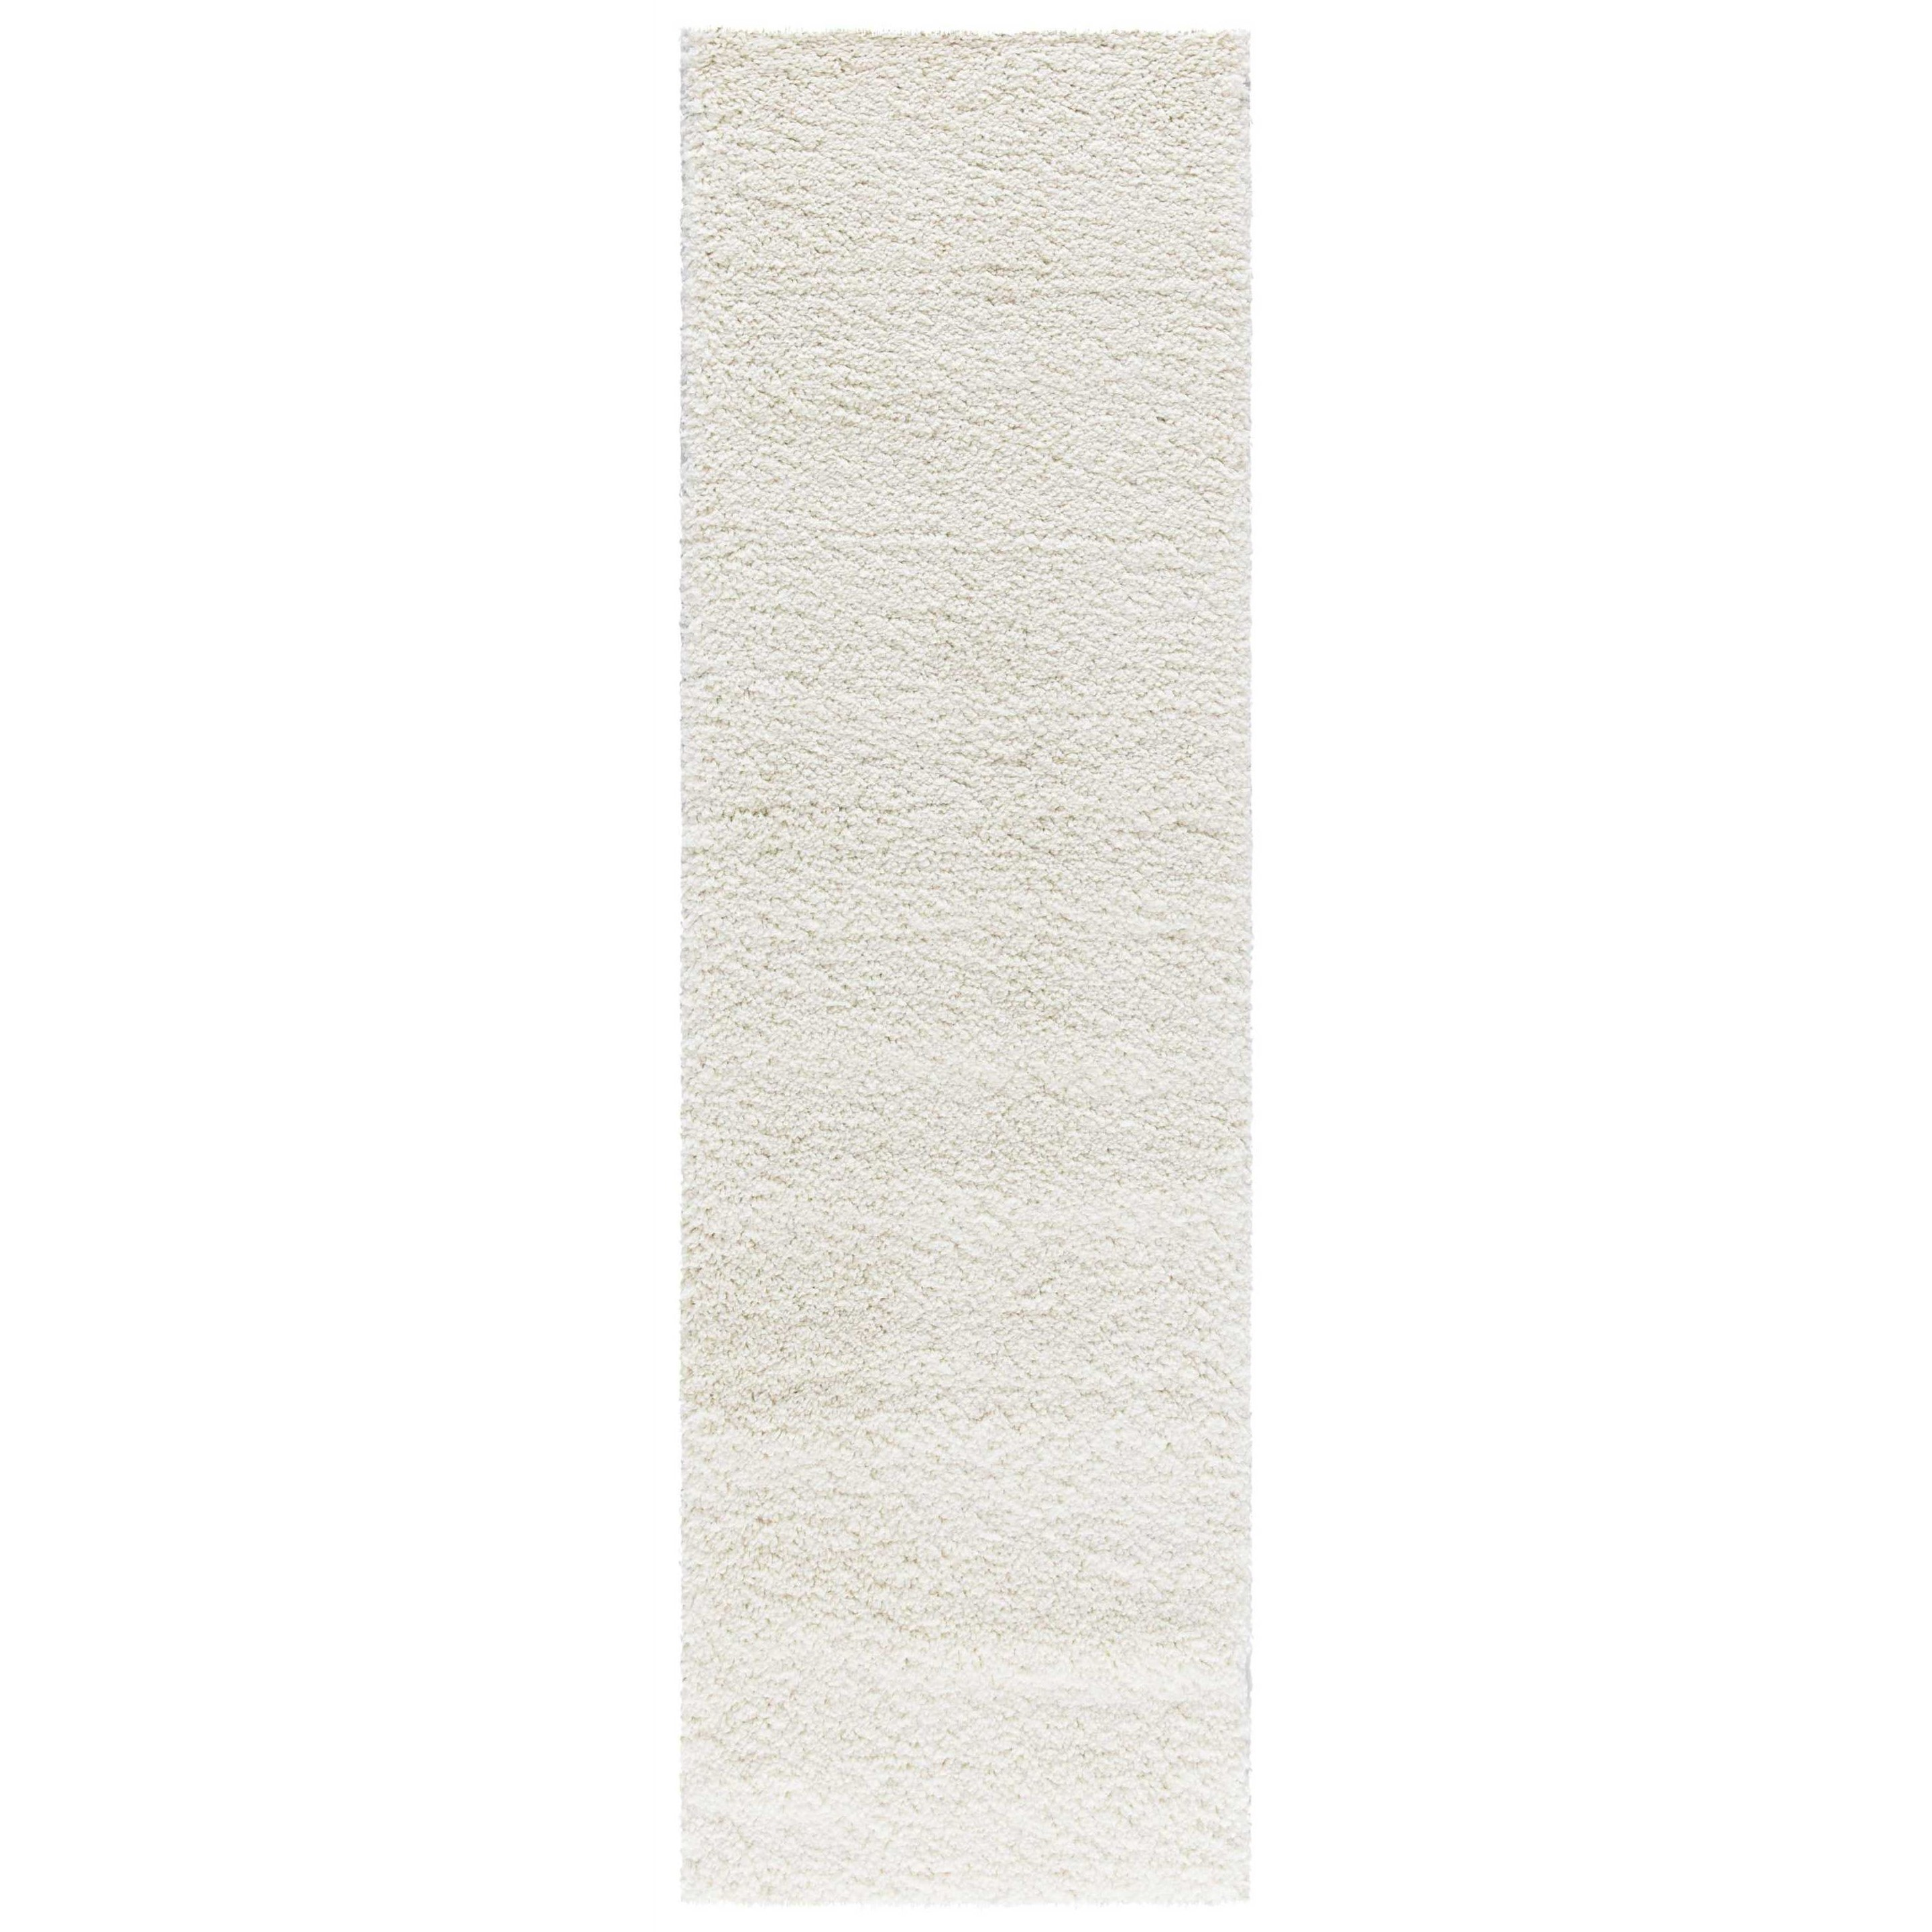 Malibu Shag Malibu Shag MSG01 White 8' Runner  Hallway R by Nourison at Home Collections Furniture